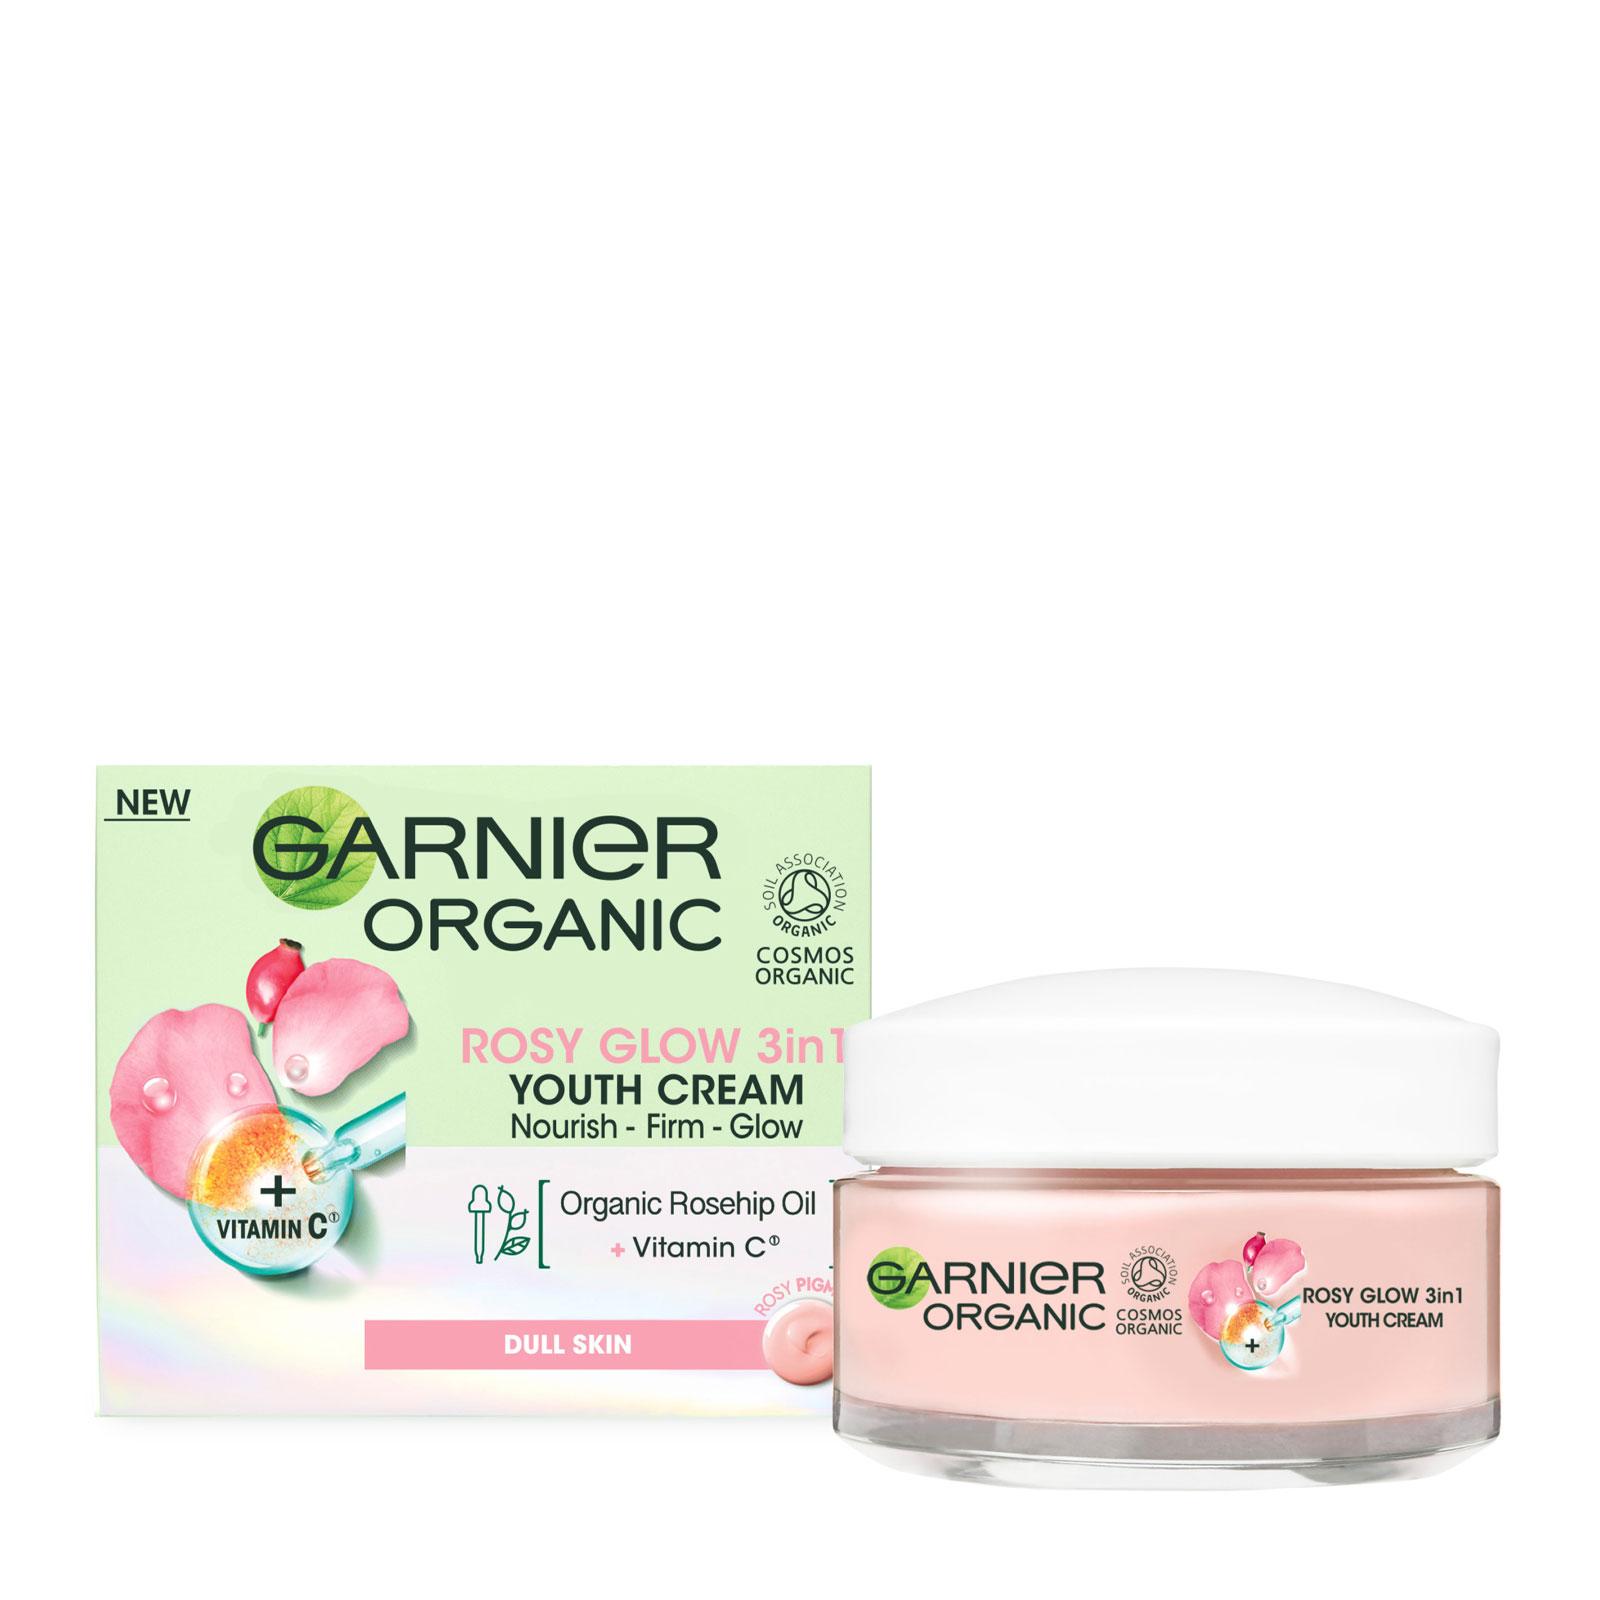 Garnier 卡尼尔 有机玫瑰三合一青春亮颜面霜 50ml